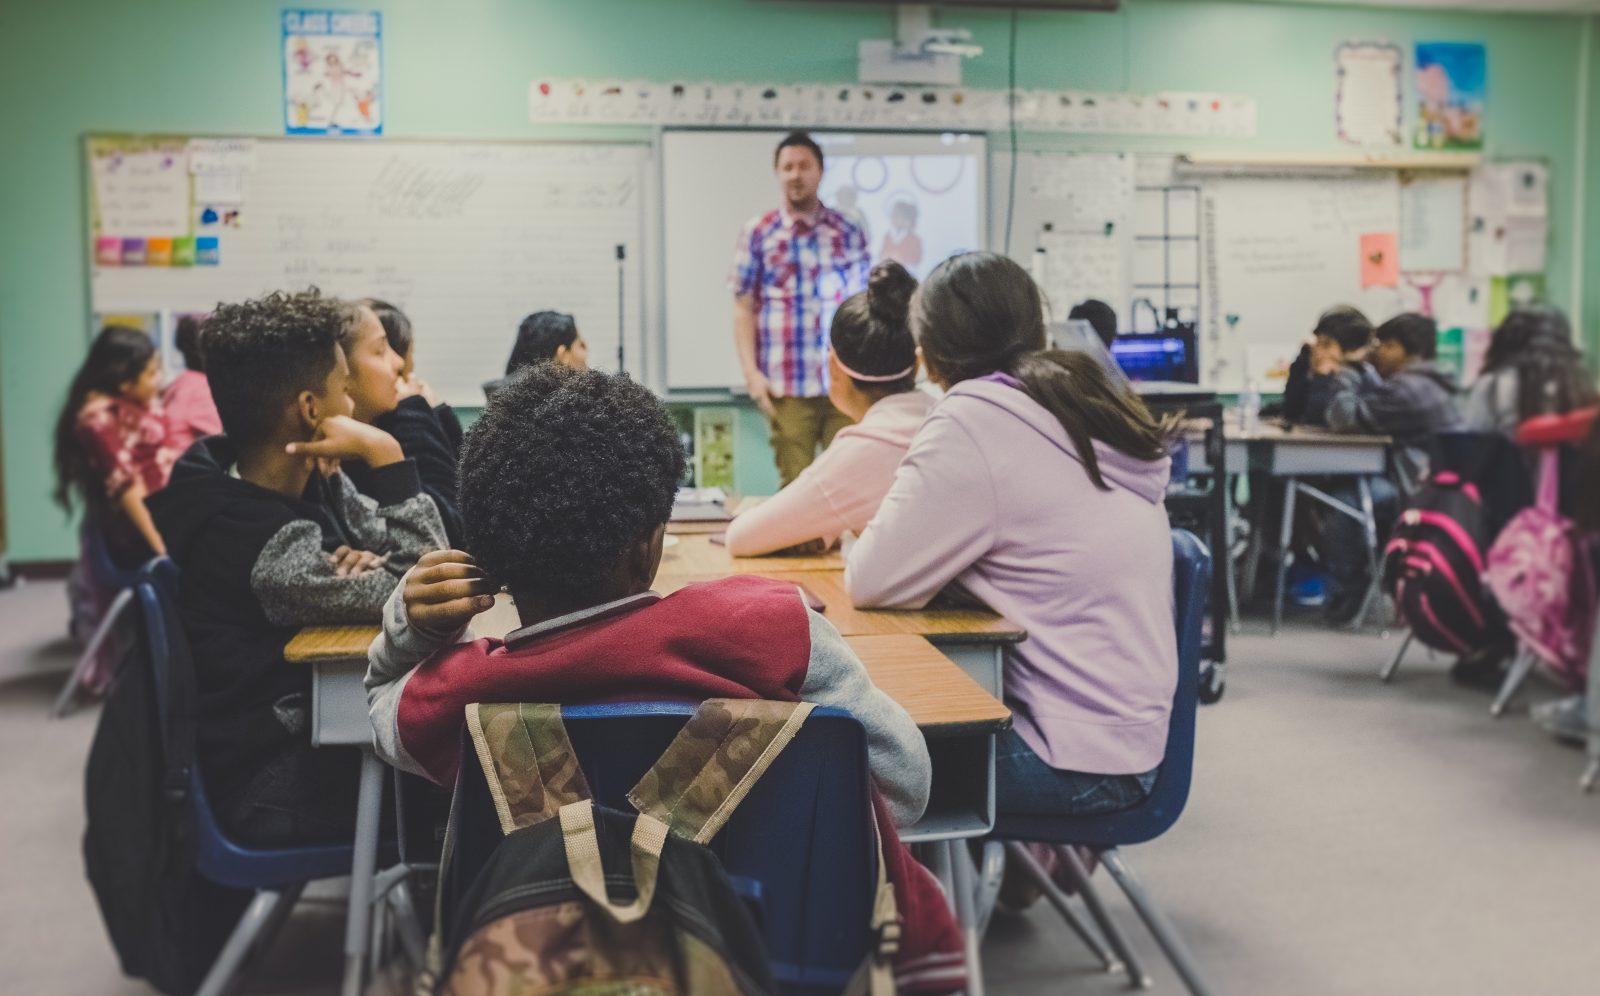 Coronavirus Deals a Blow to US Schools